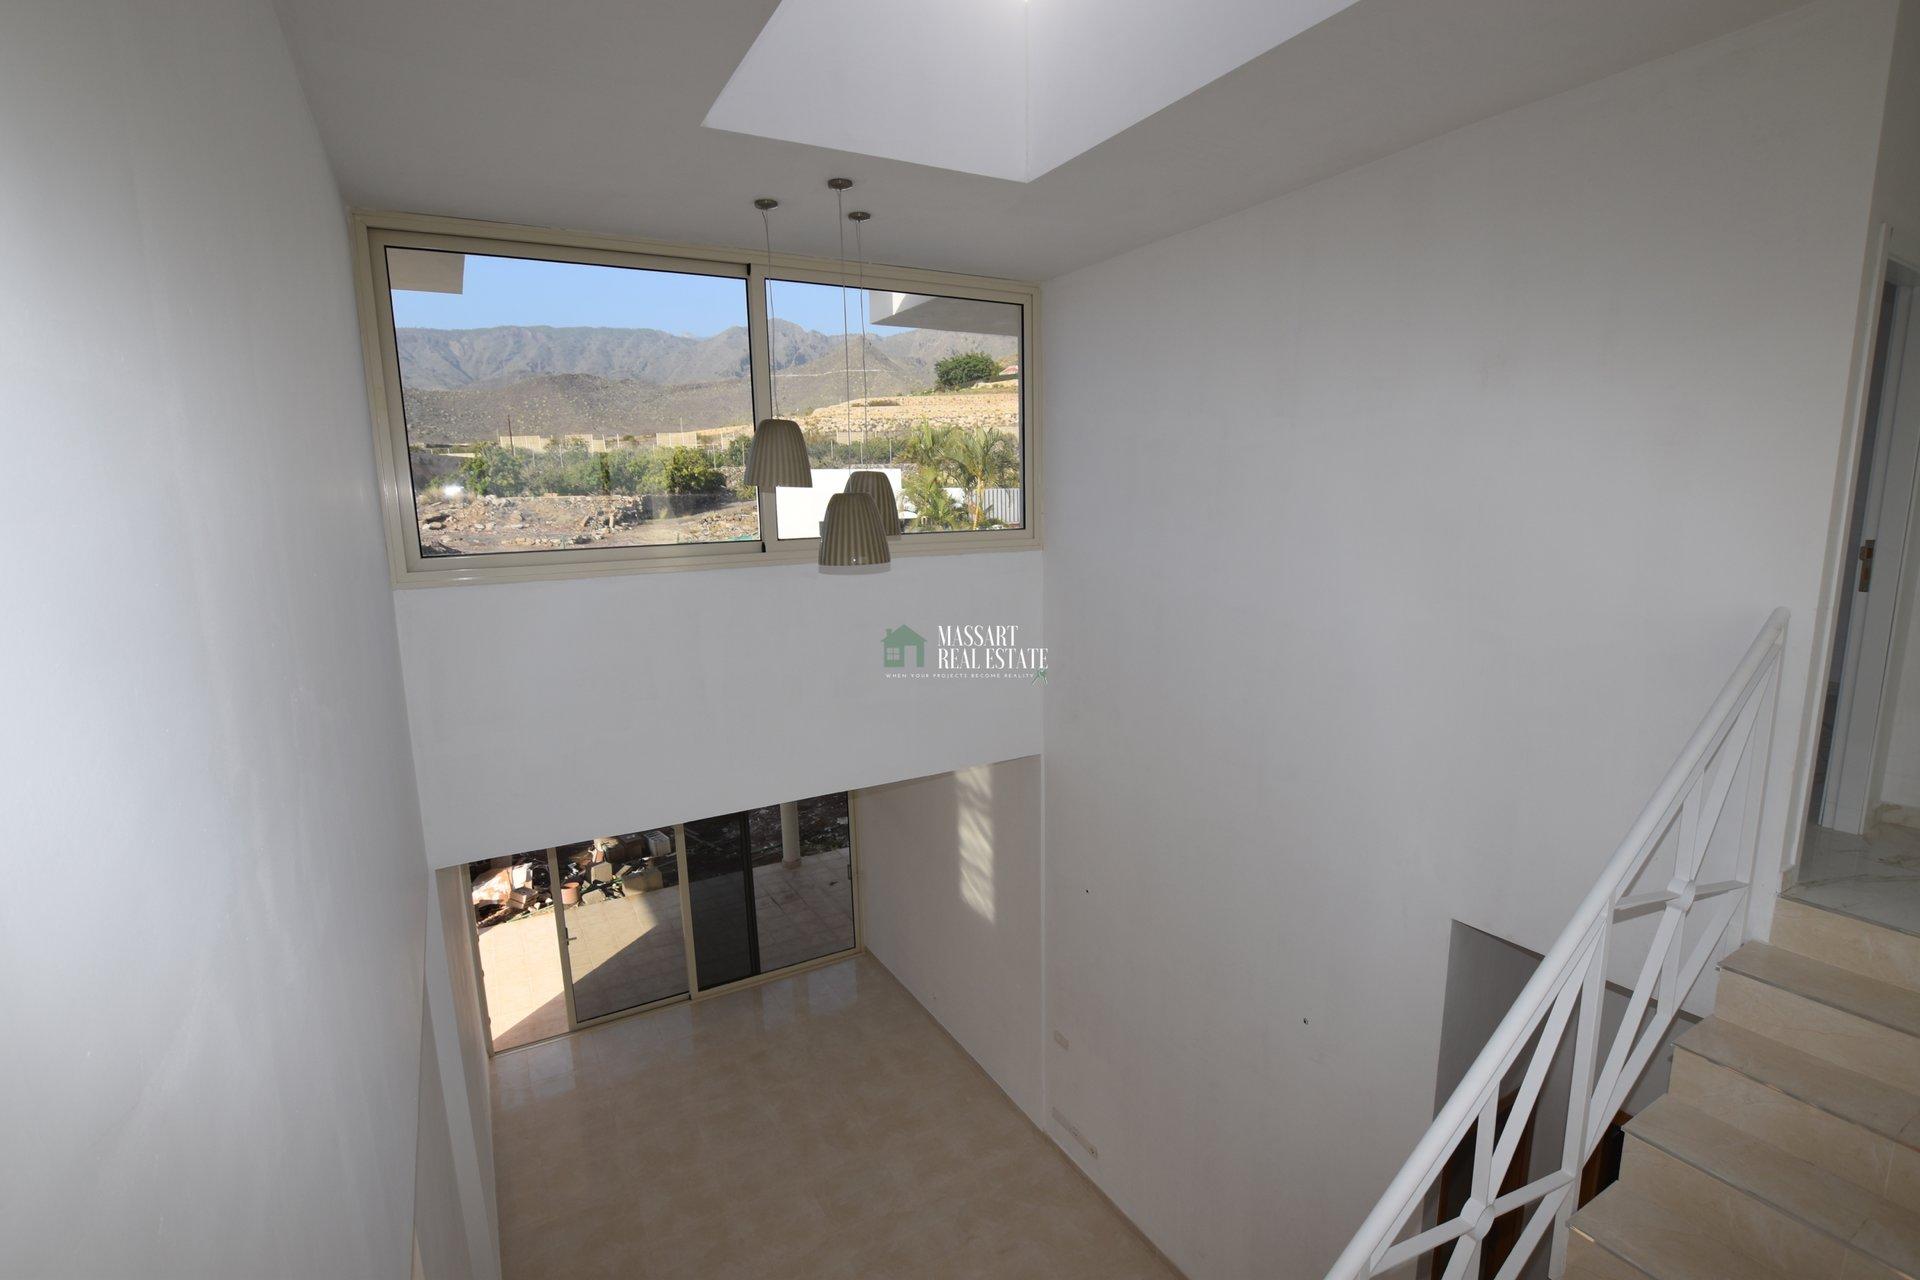 For sale in the quiet area of El Madroñal (Adeje), magnificent villa under construction.